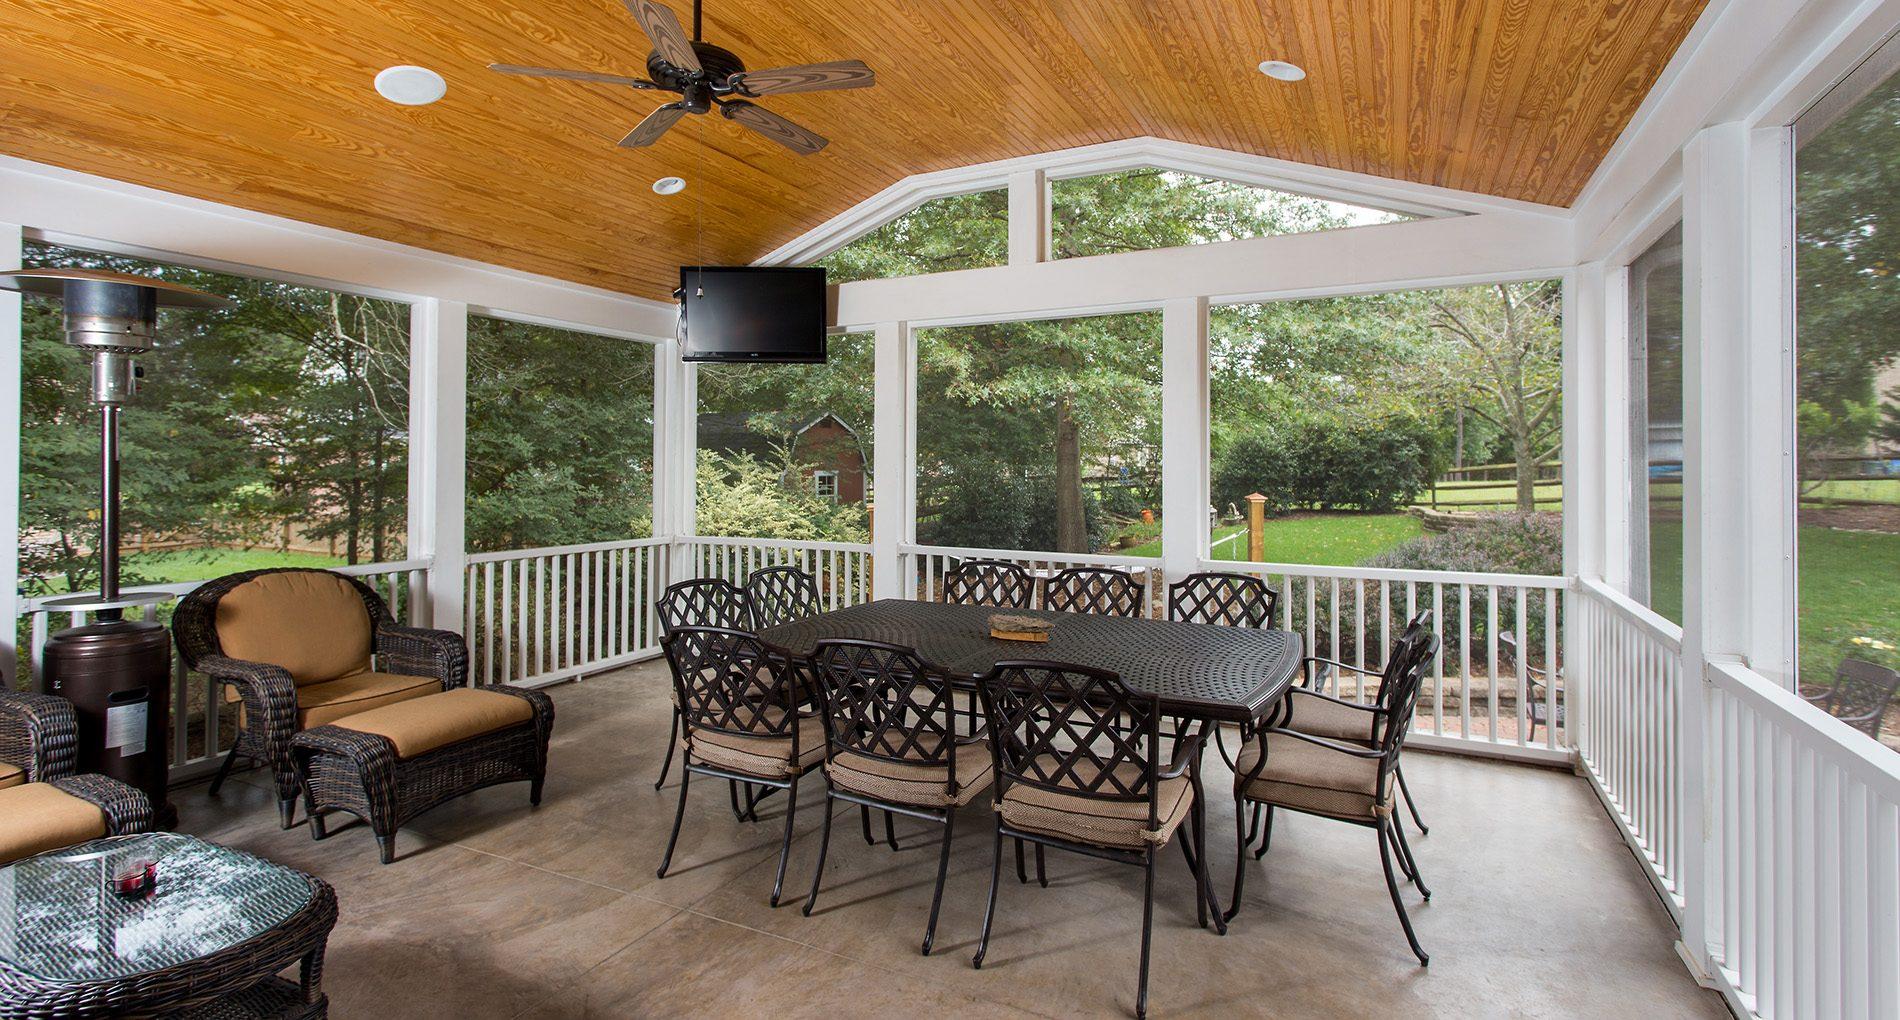 Home Renovation Lakenorman Jonespatio Slider2